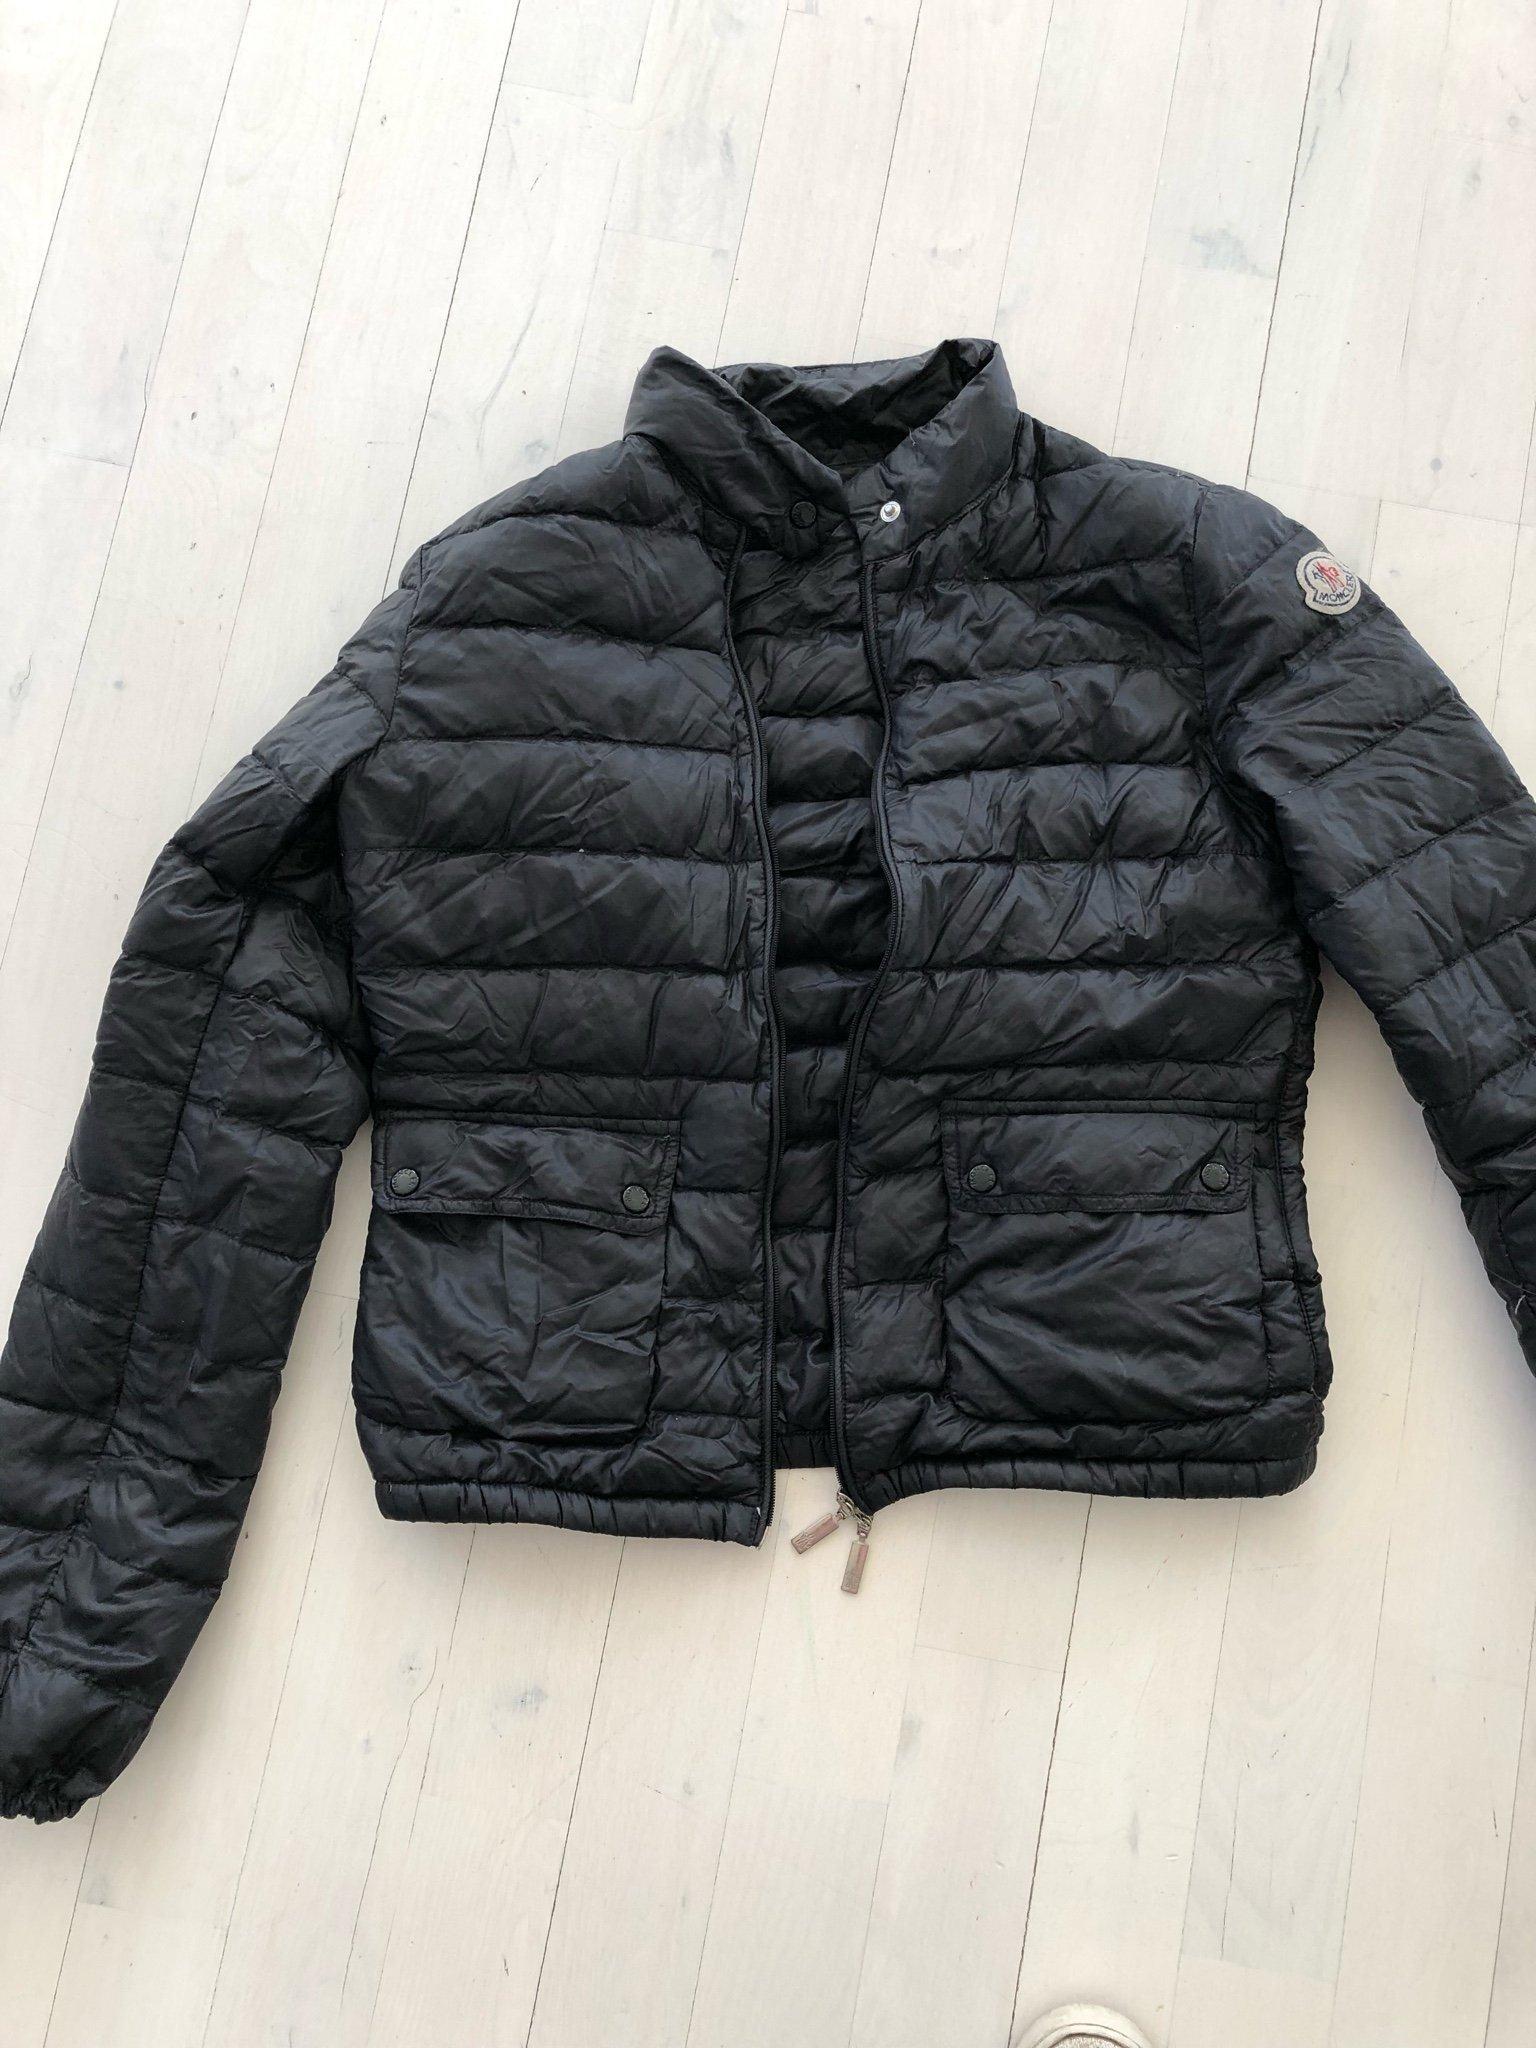 386946f04 Moncler Lans, storlek 1 (346623610) ᐈ Köp på Tradera